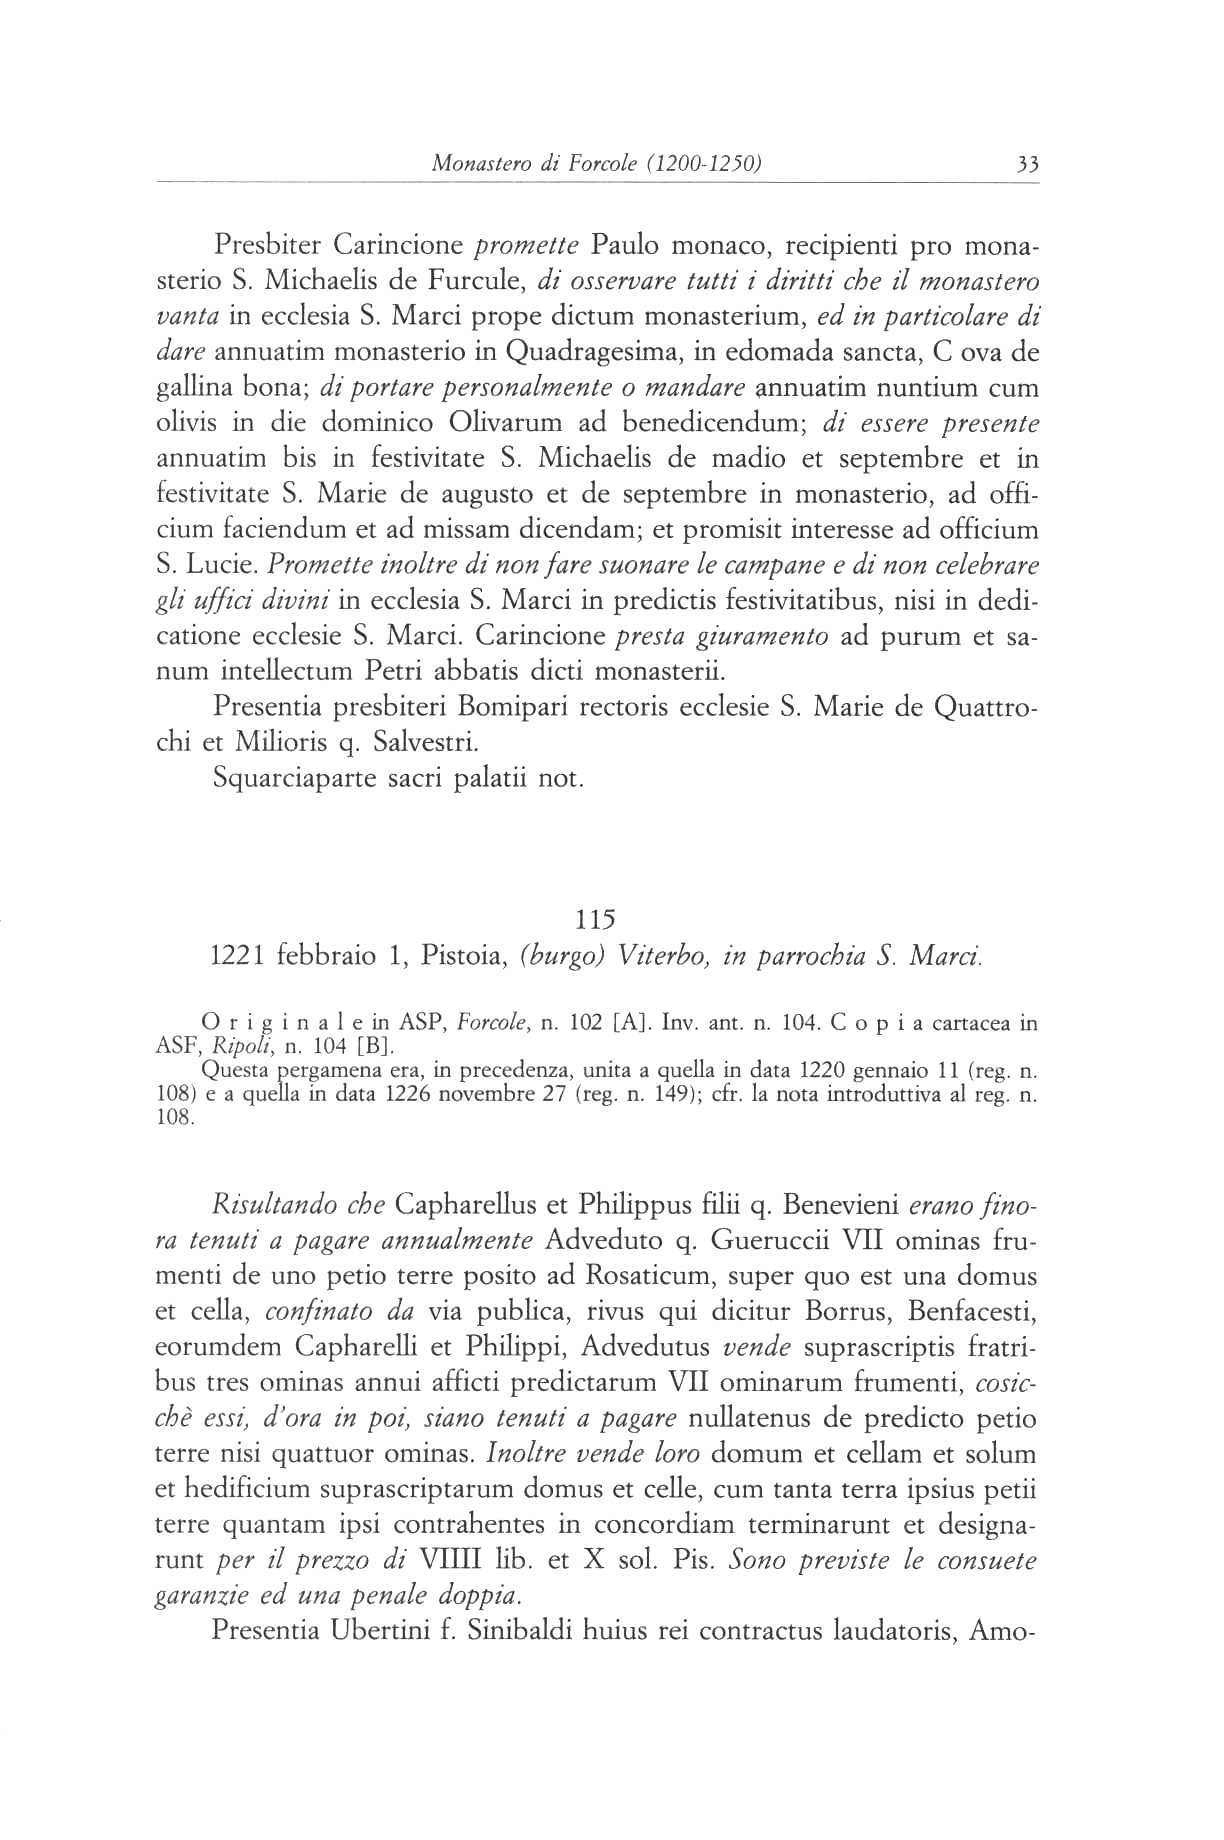 Monastero Forcole 0033.jpg